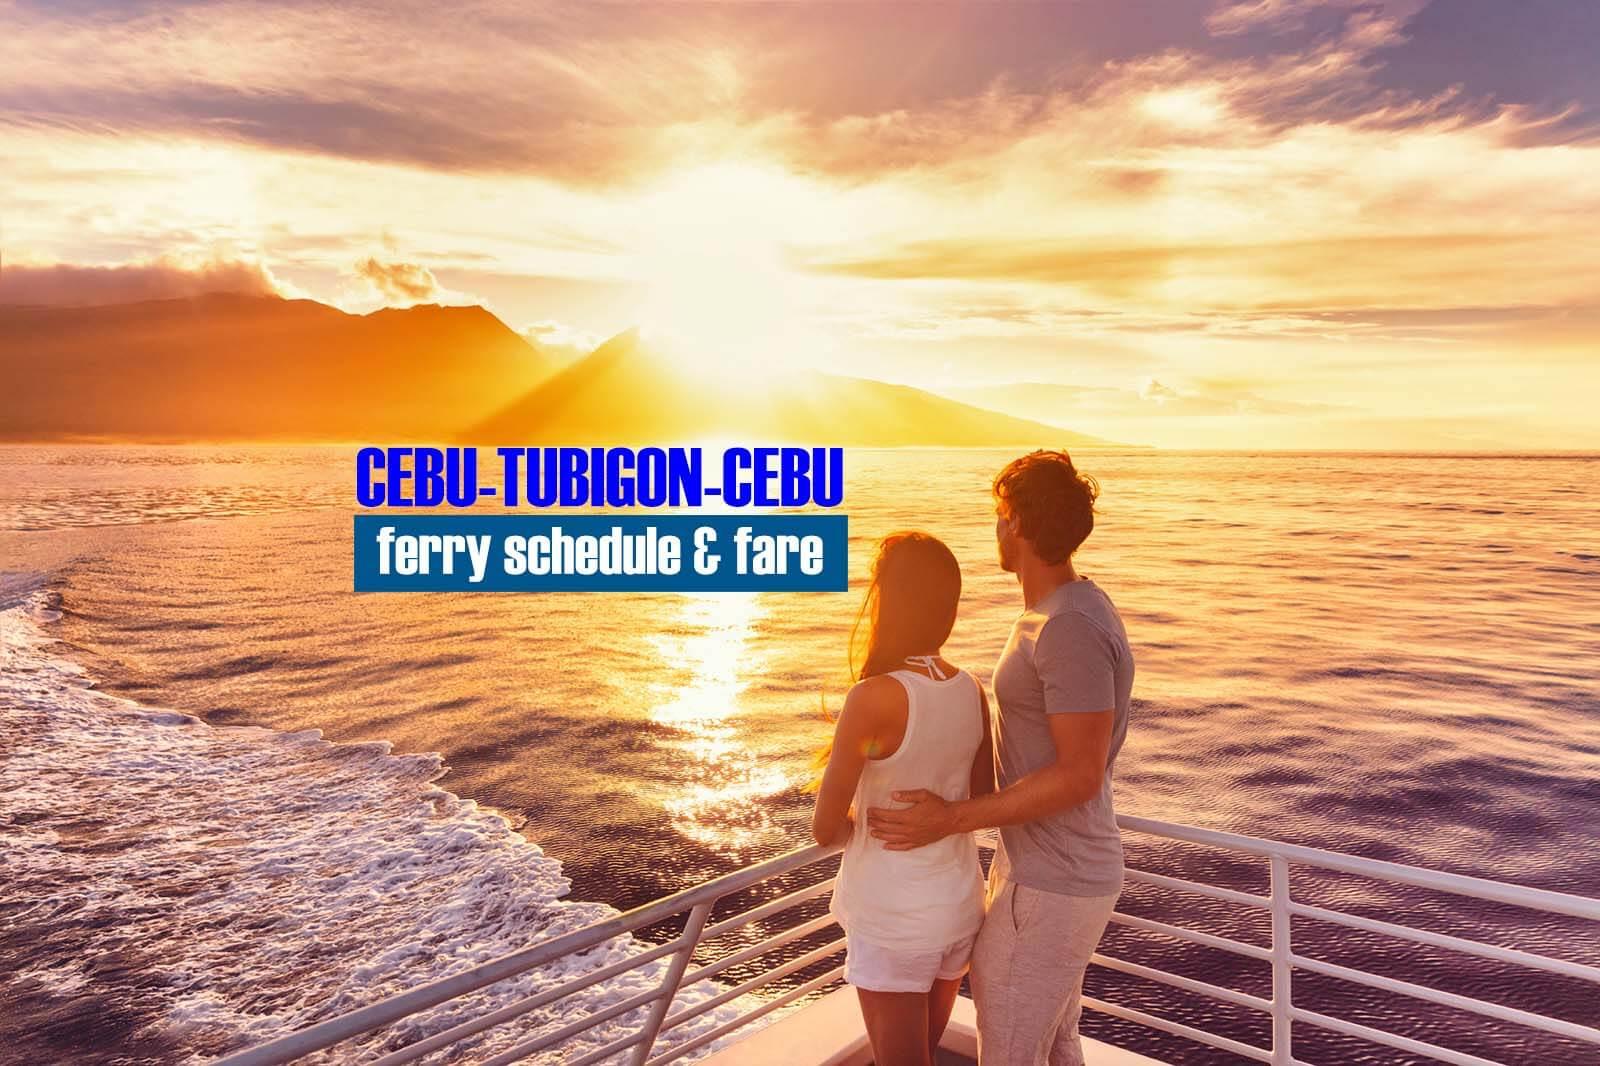 2021 Cebu to Tubigon Ferry Schedule and Fare Rates